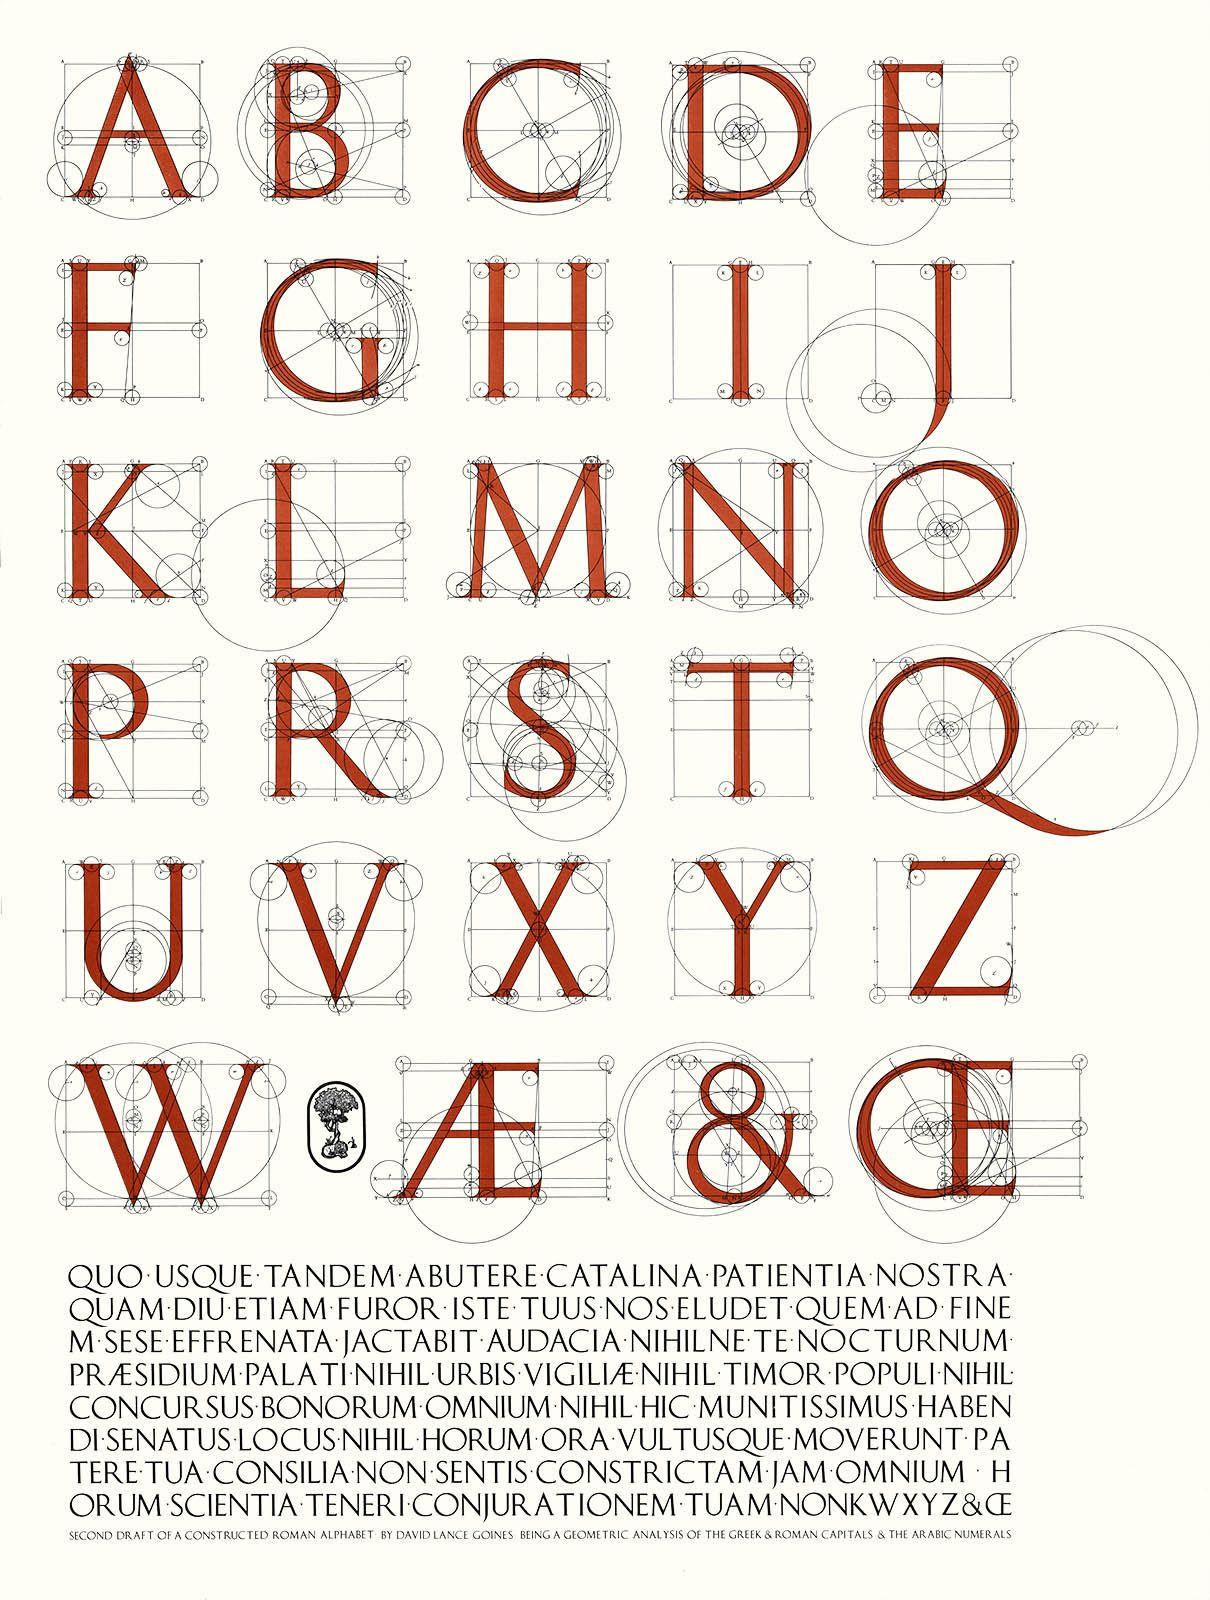 Constructed Roman Alphabet